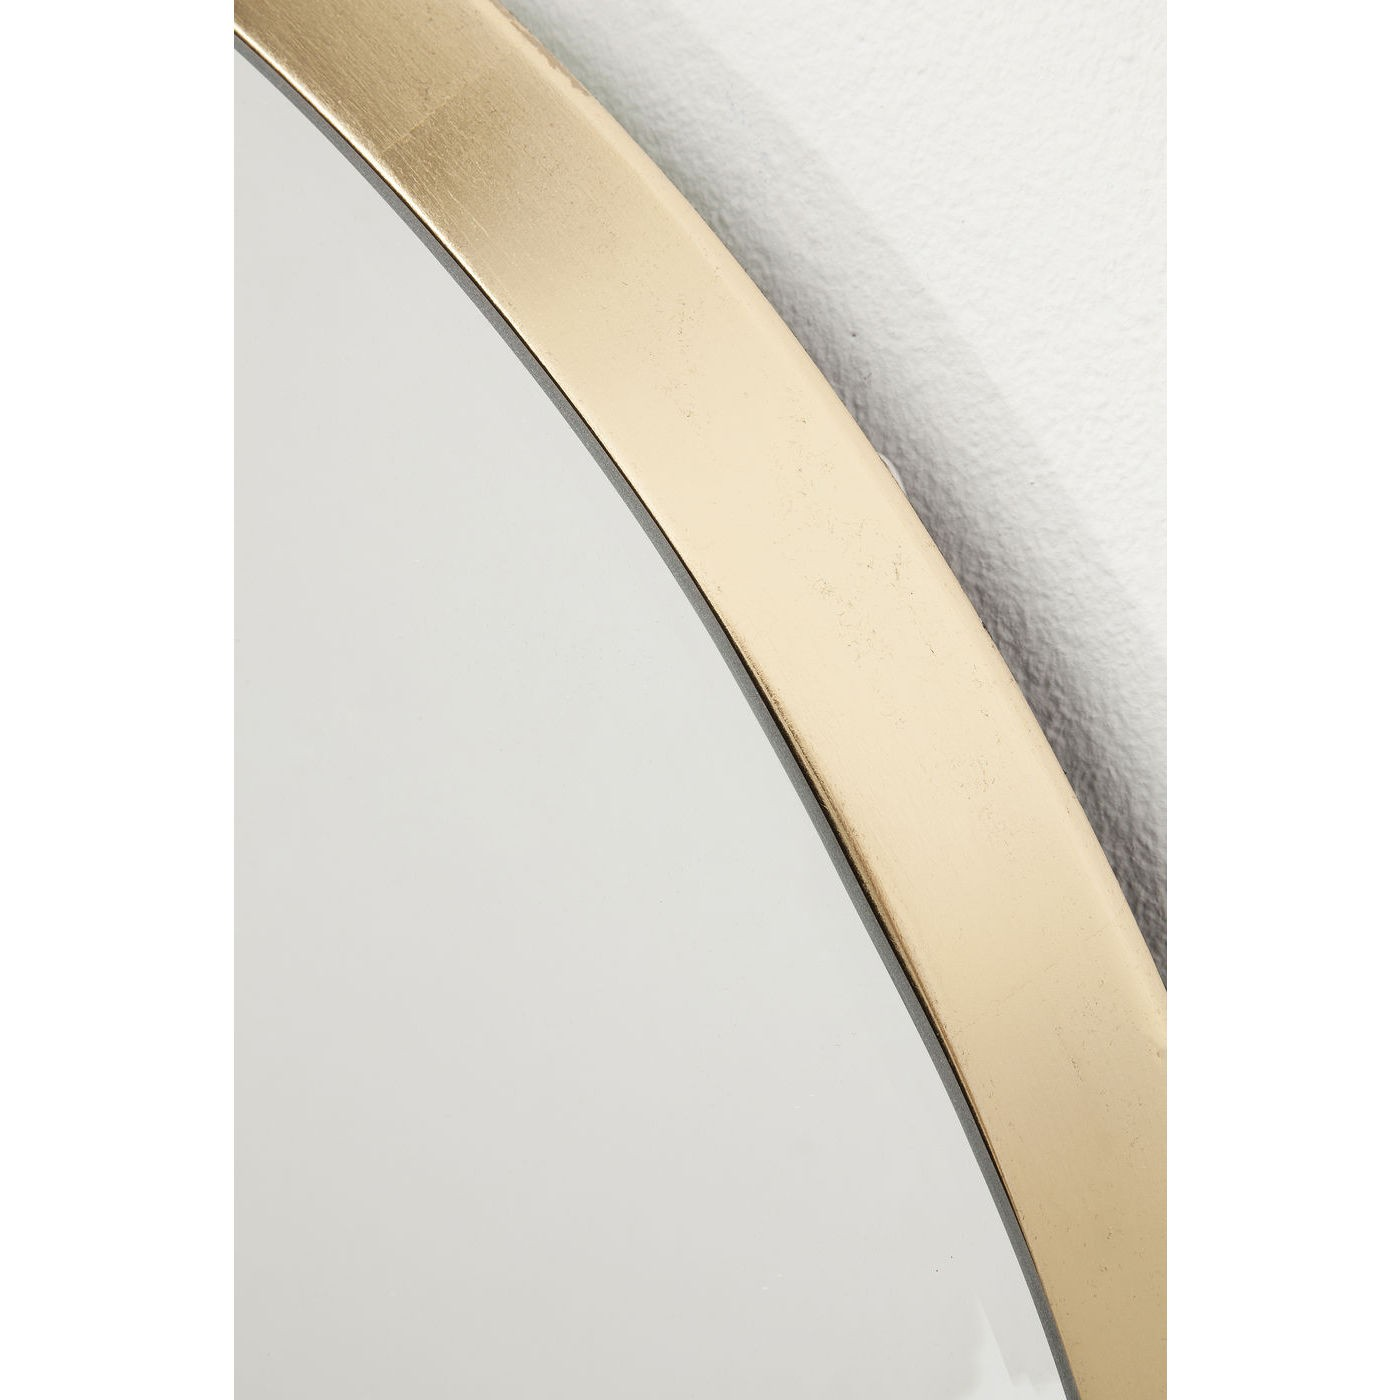 Miroir Jetset doré 73cm Kare Design